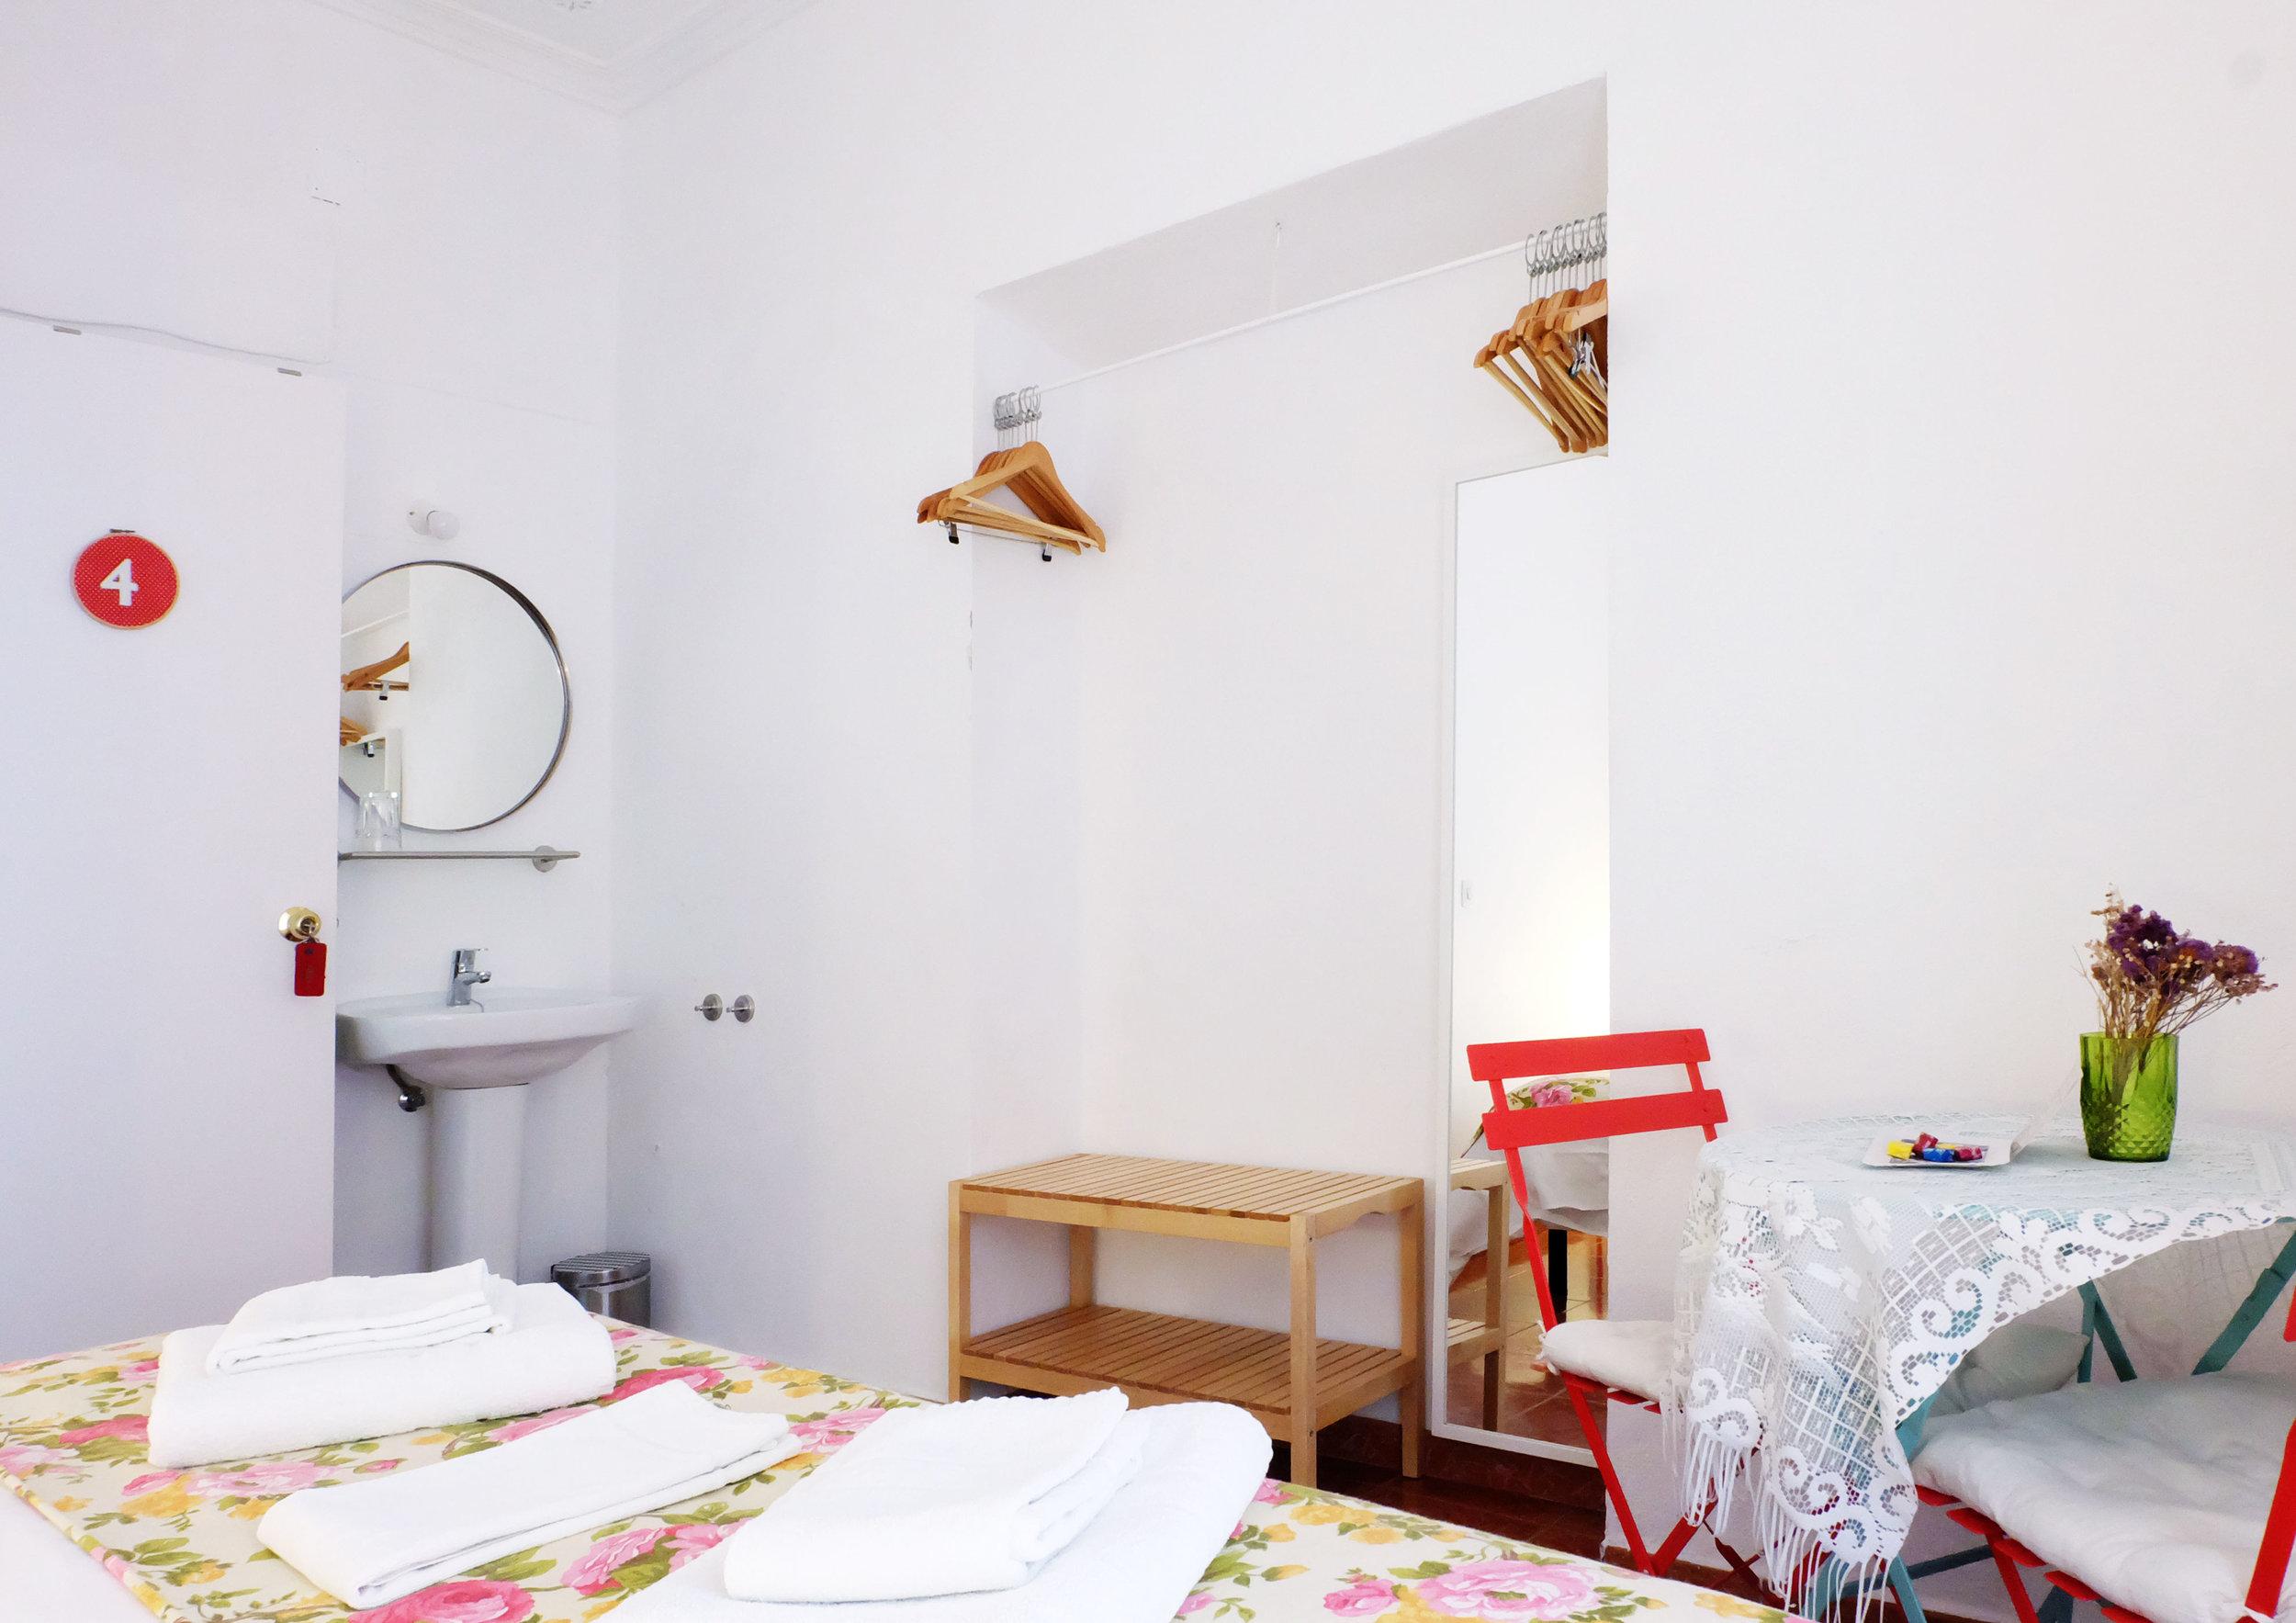 Hotel-Casa-de-Huespedes-Santa-Maria-Habitacion-4-7.jpg